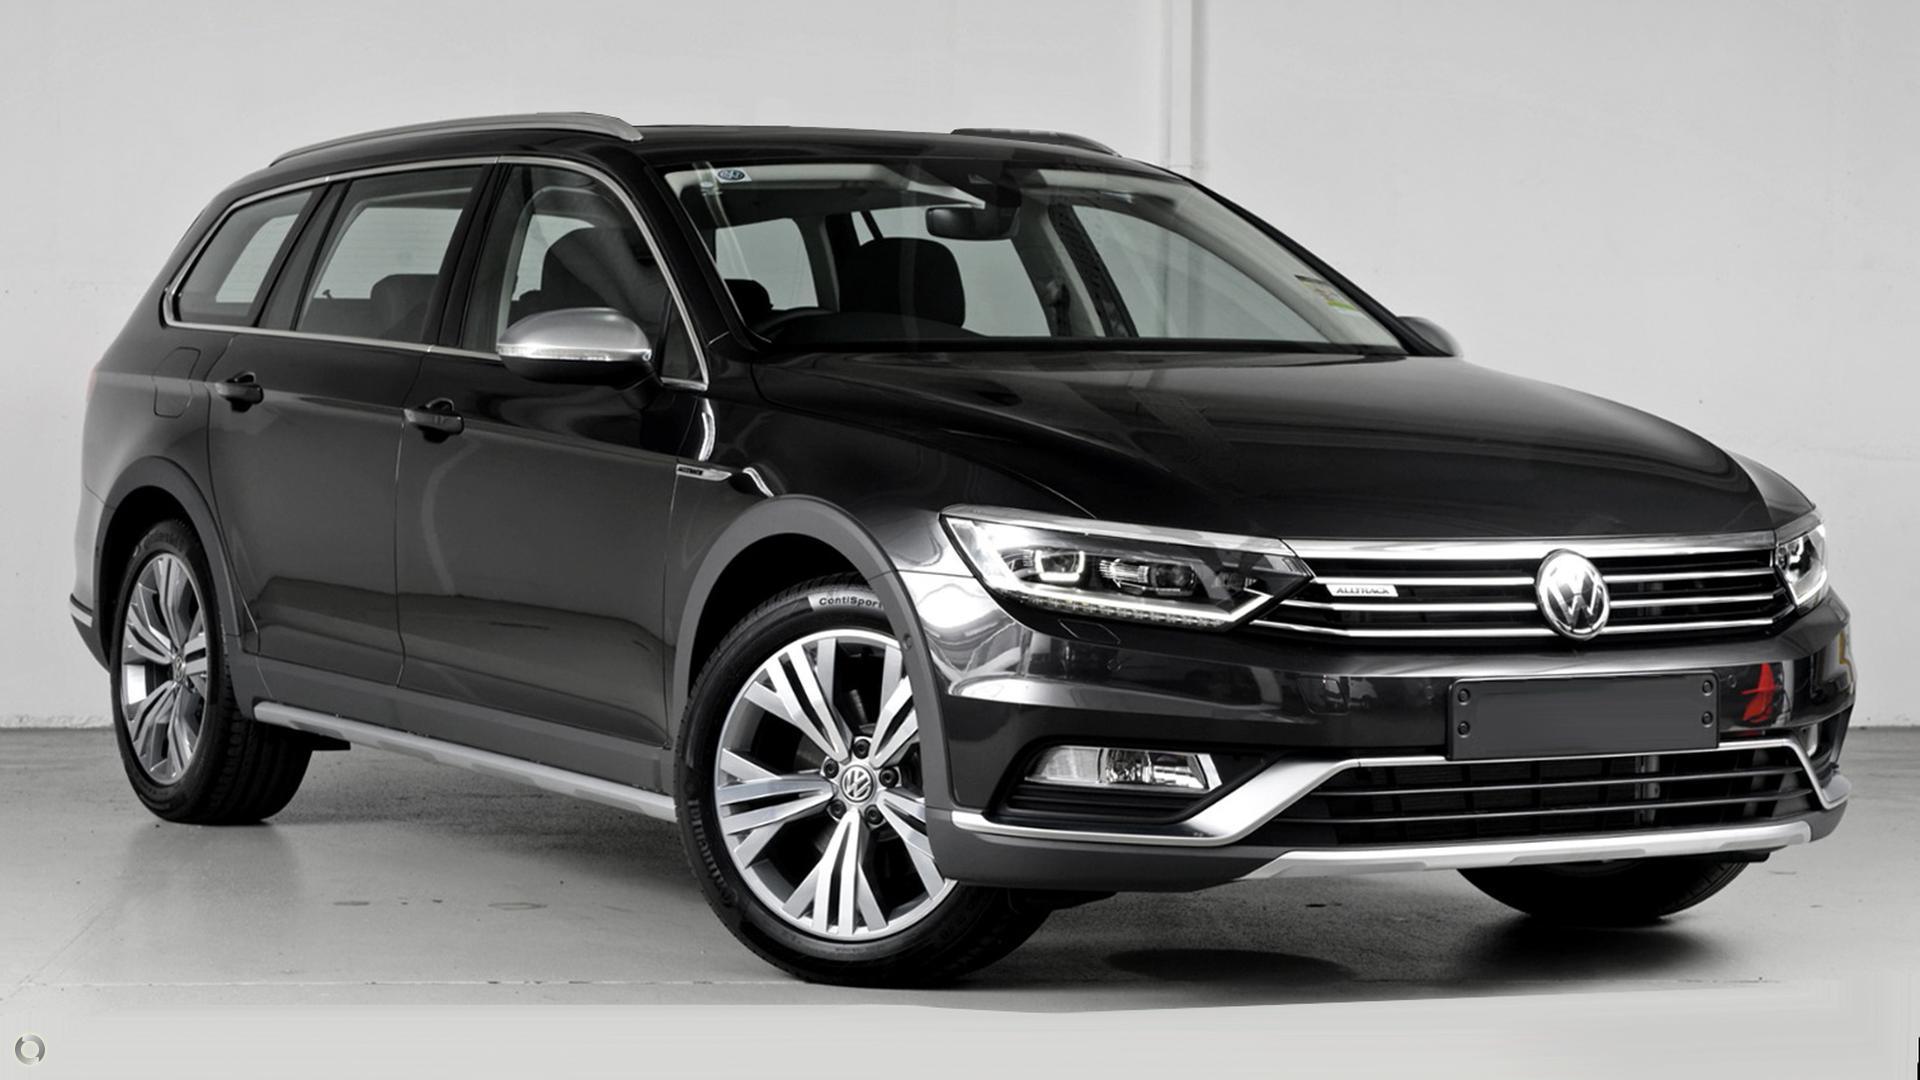 2018 Volkswagen Passat 140tdi Alltrack